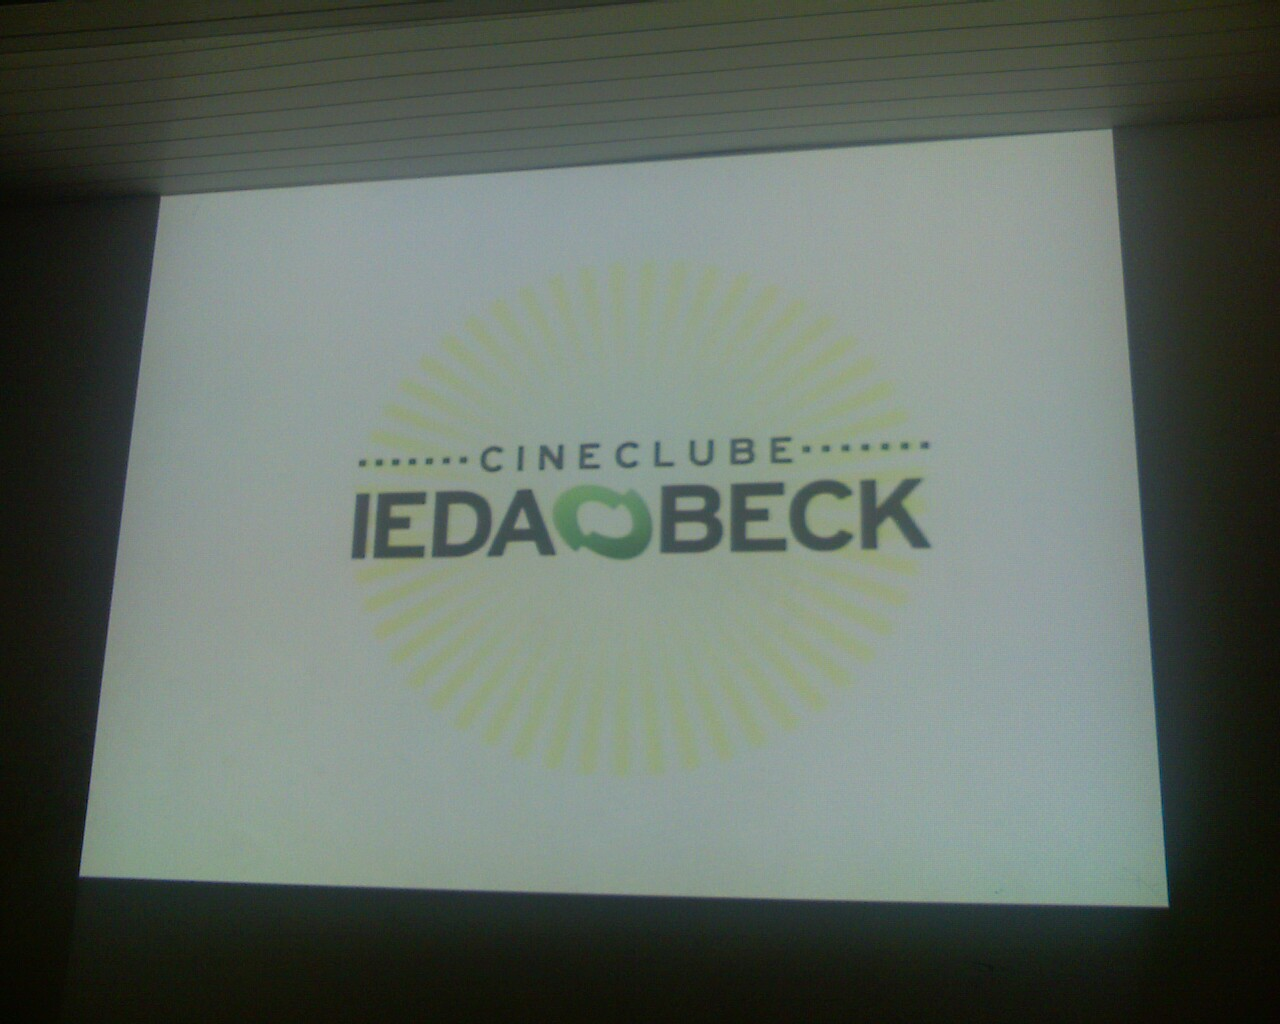 Cineclube Ieda Beck